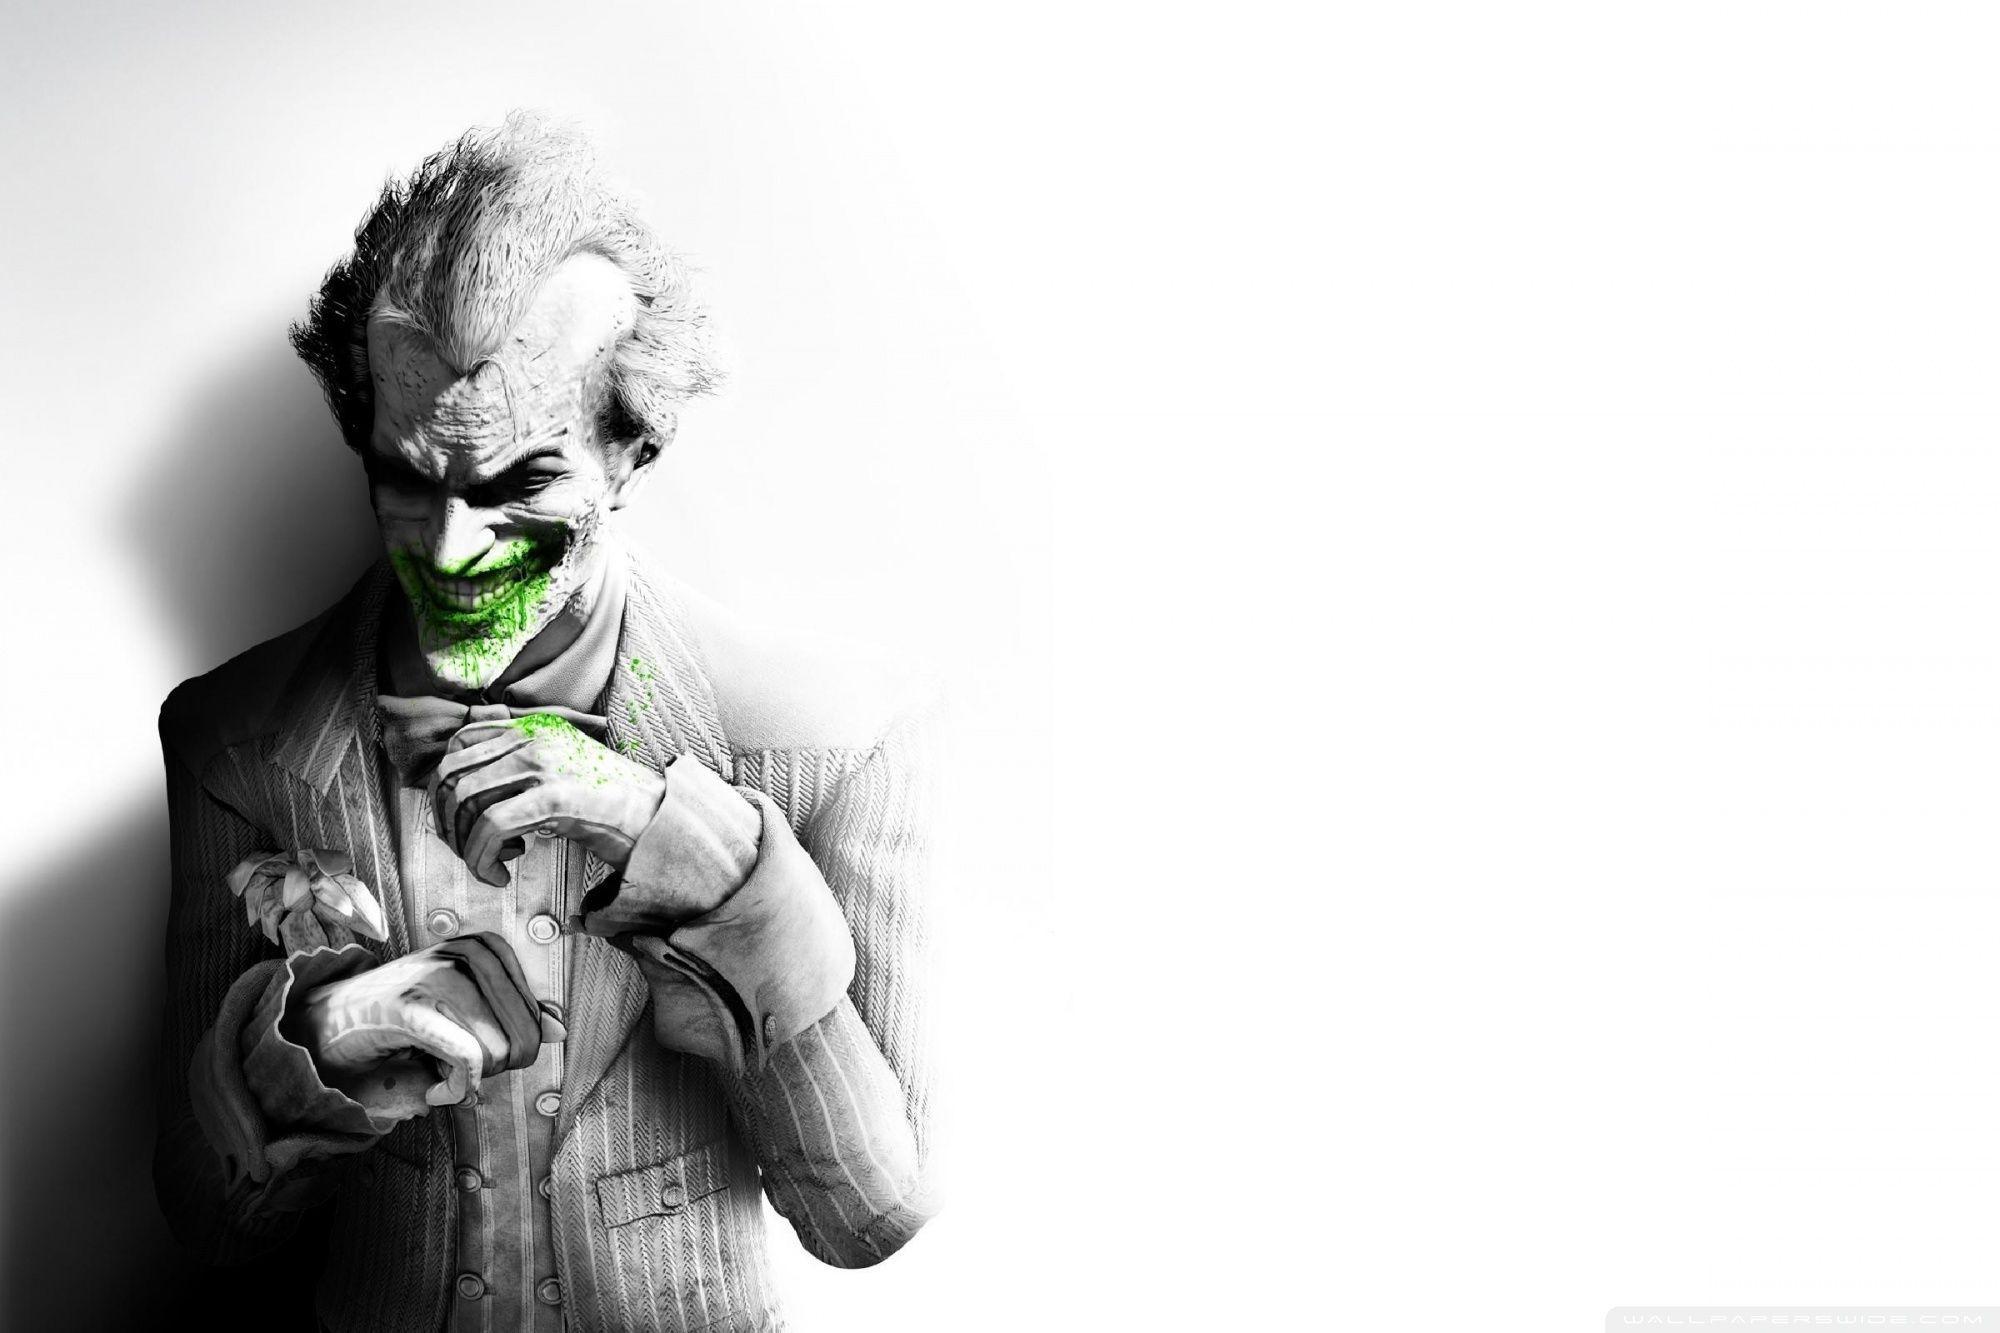 Batman Arkham Asylum Joker Wallpapers - Wallpaper Cave